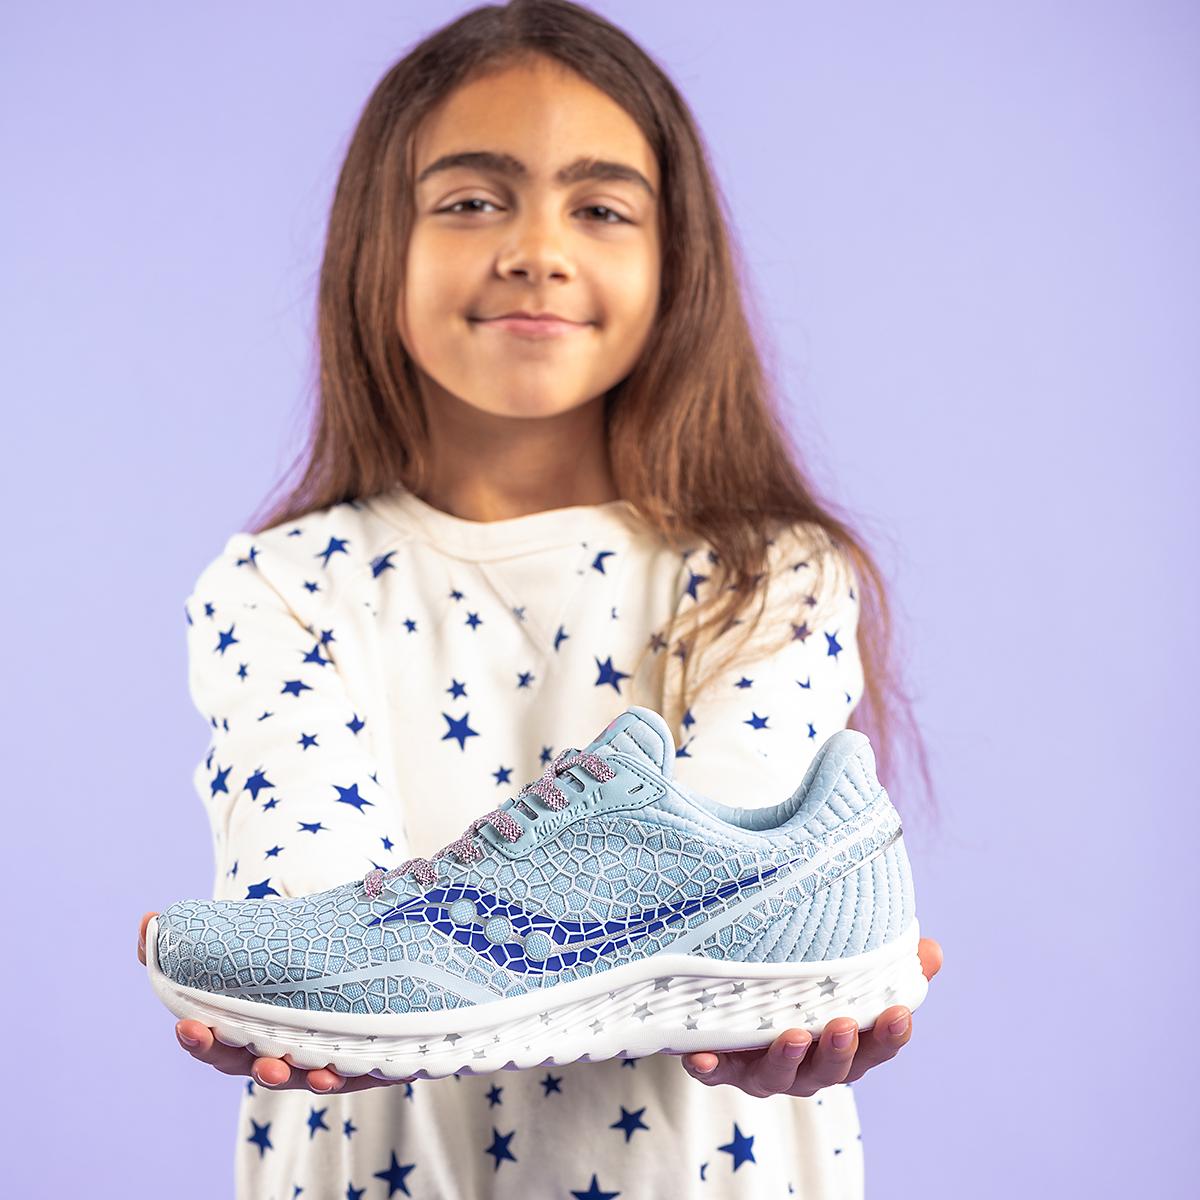 Men's Saucony Kinvara 11 Running Shoe - Color: Jordynn - Size: 3.5 - Width: Regular, Jordynn, large, image 6